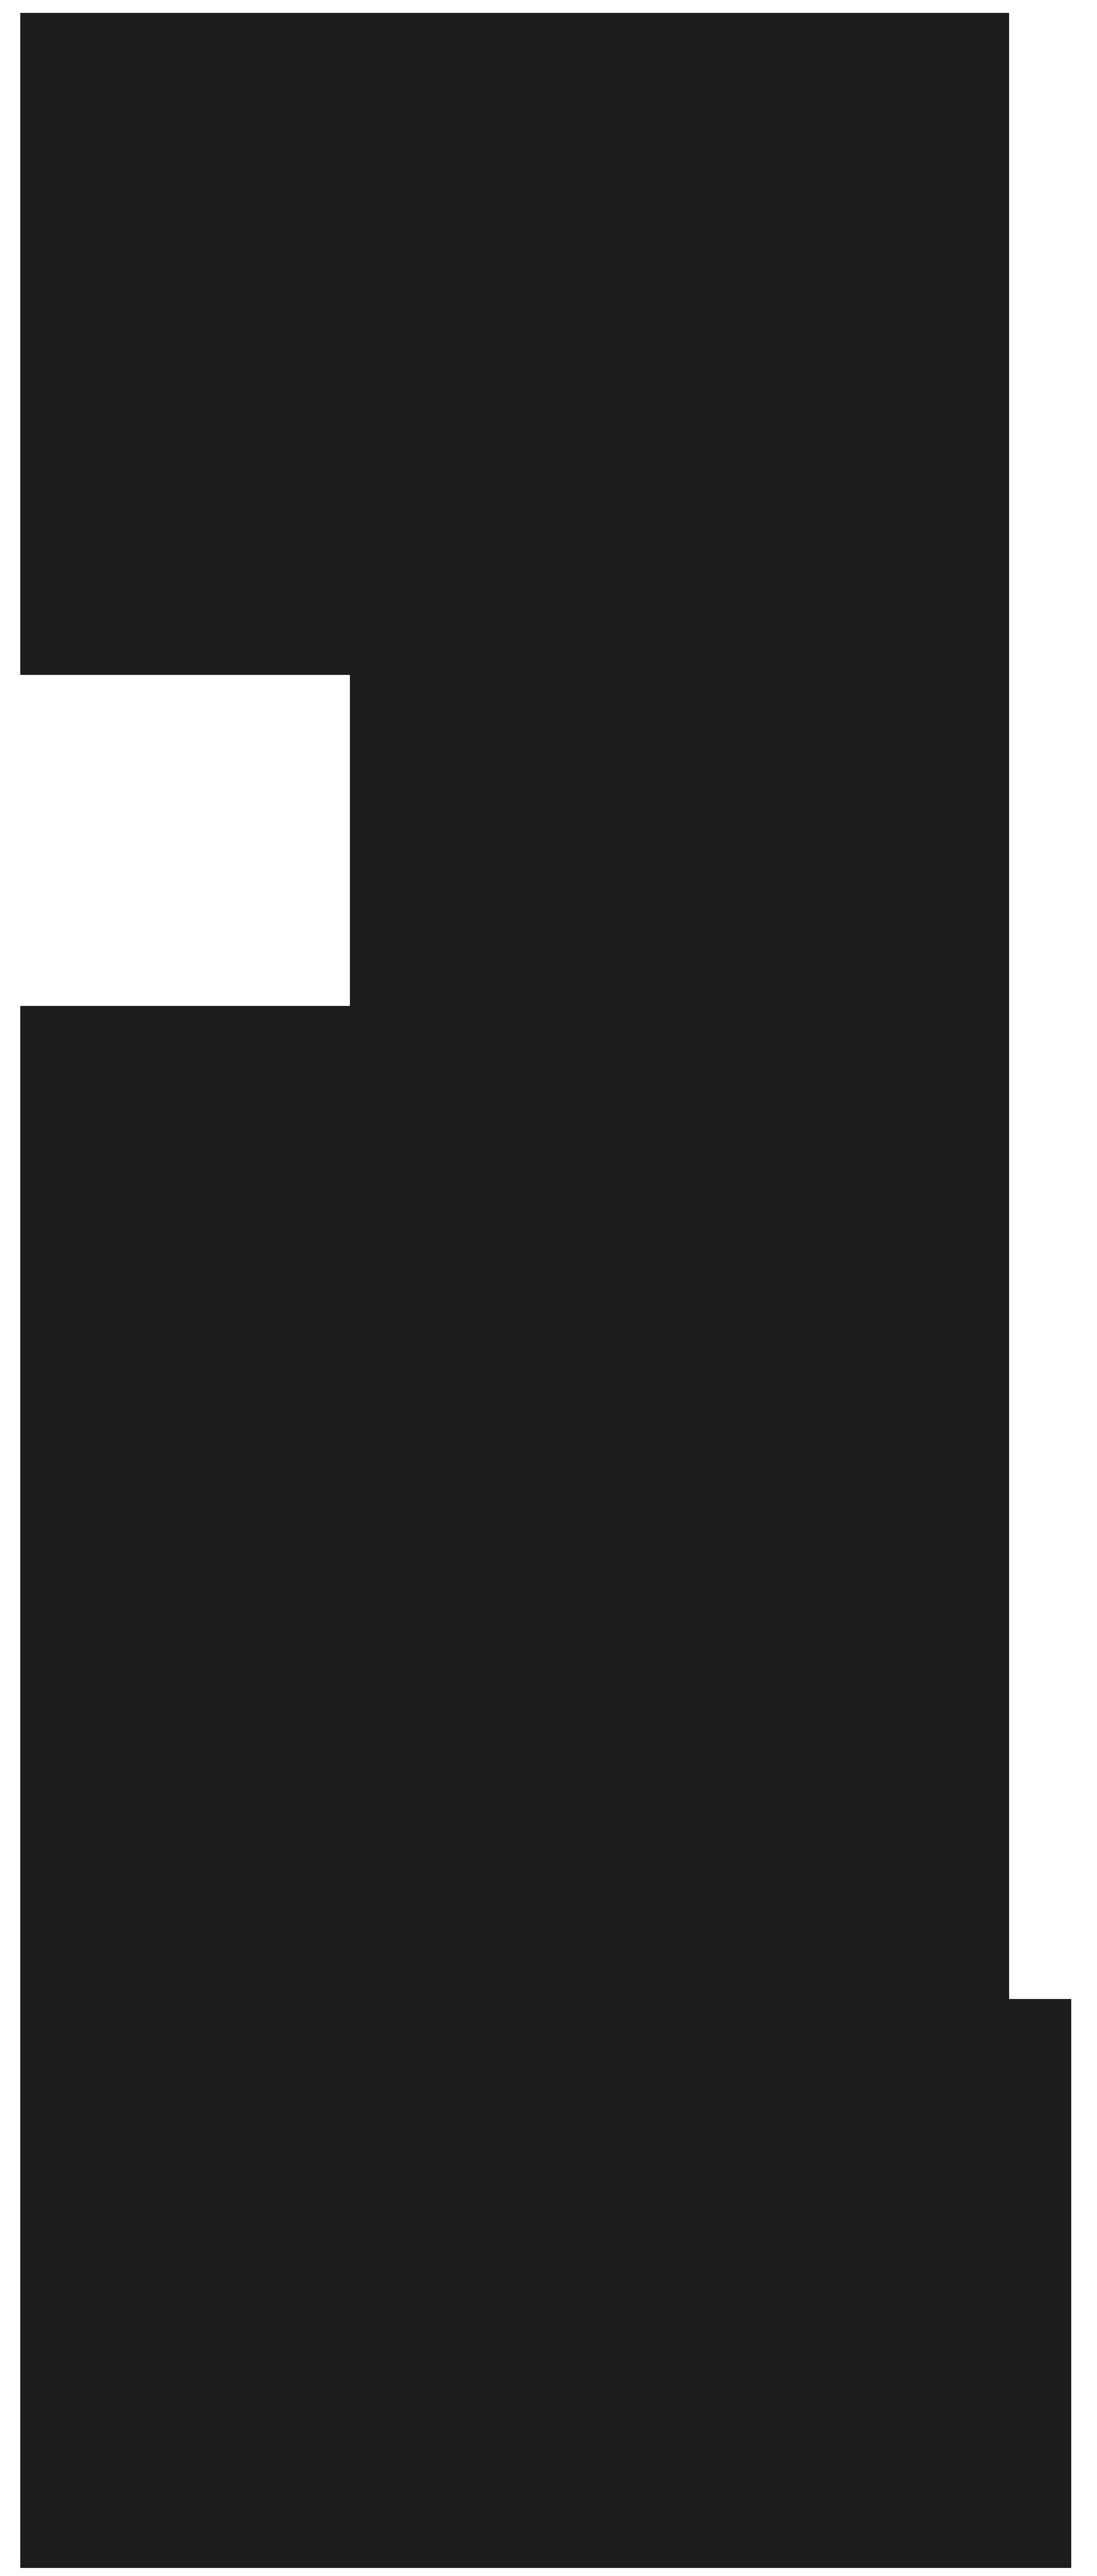 3408x8000 Cinema Camera Silhouette Png Clip Art